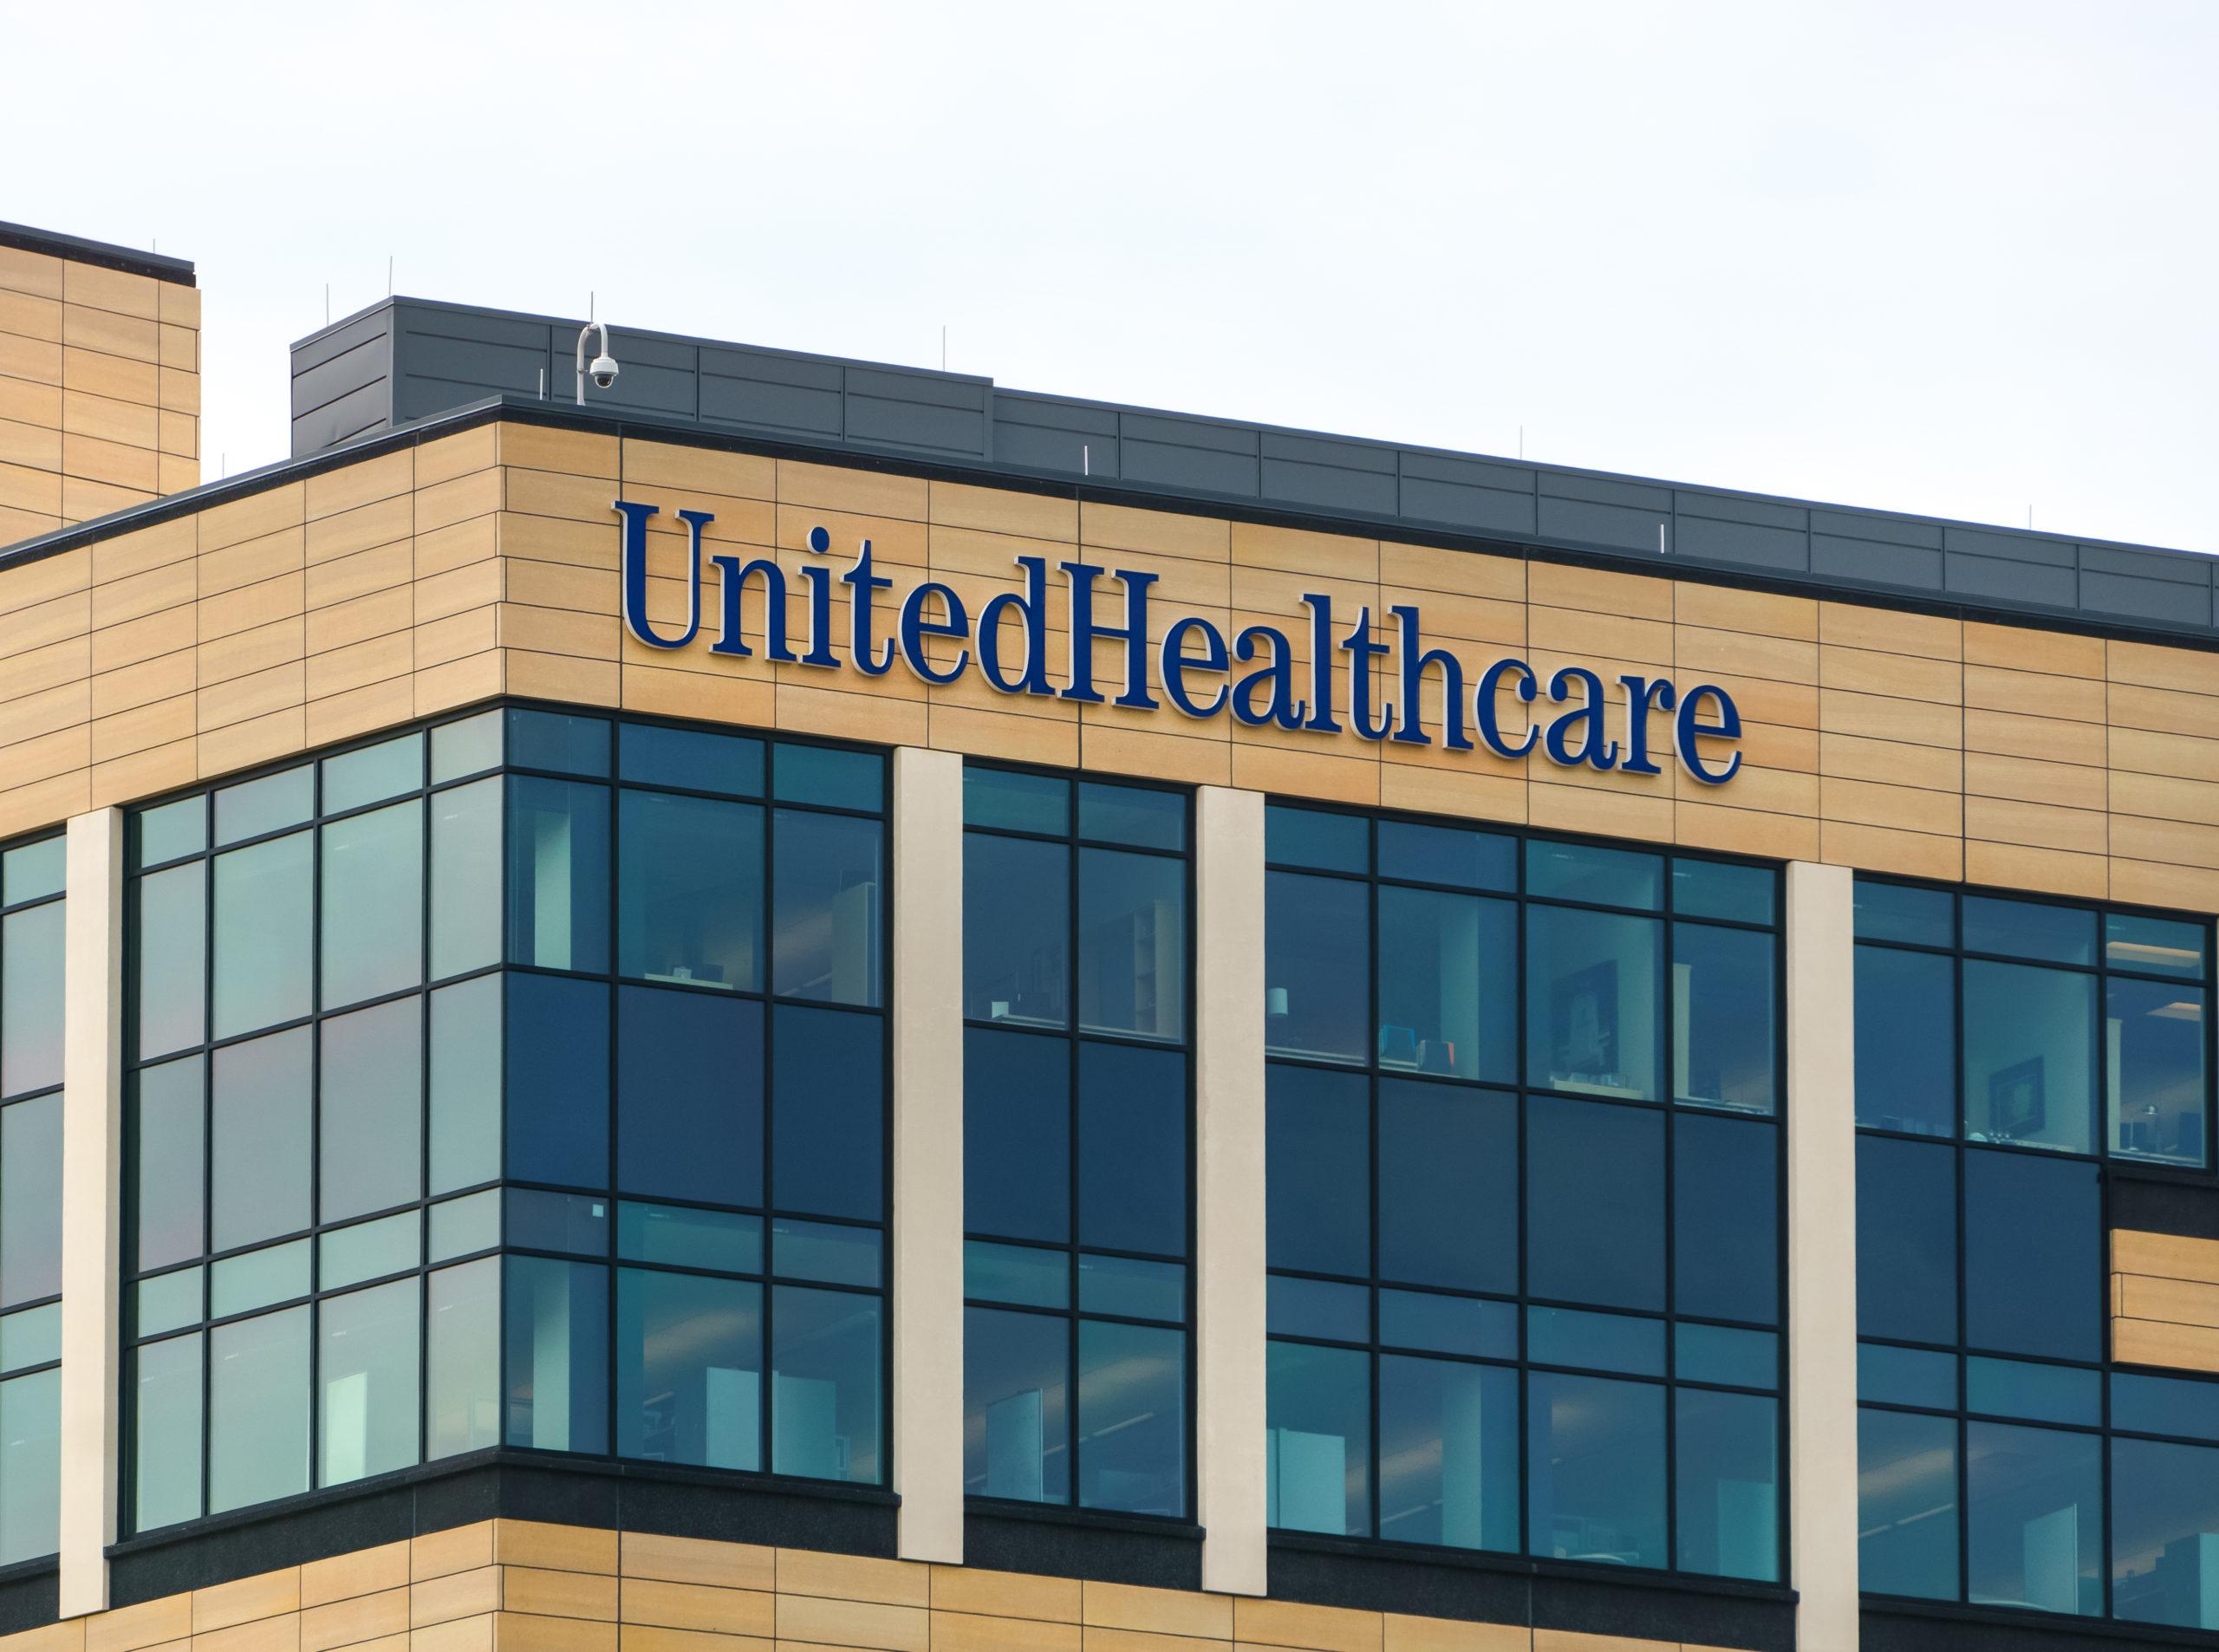 The UnitedHealth Group headquarters in Minnetonka, Minnesota. (Ken Wolter/Shutterstock)